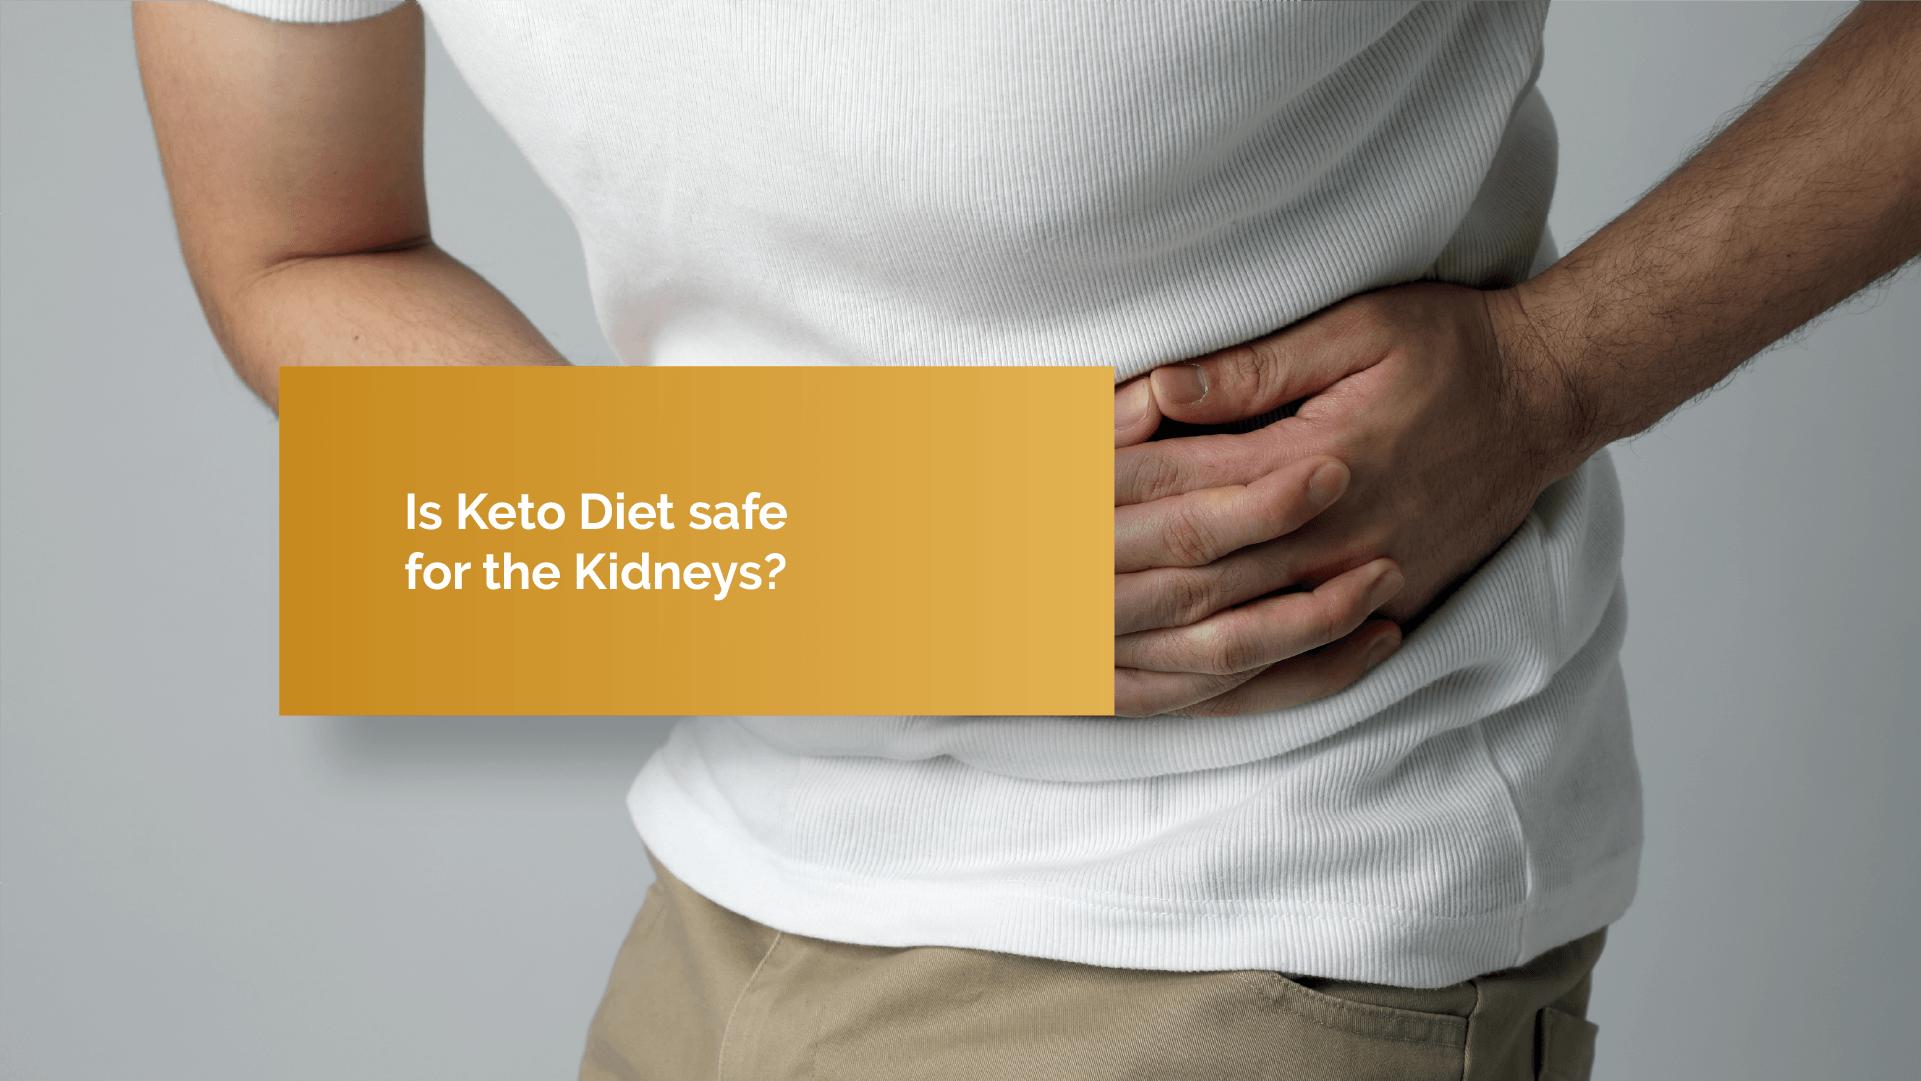 Keto Diet and Kidneys